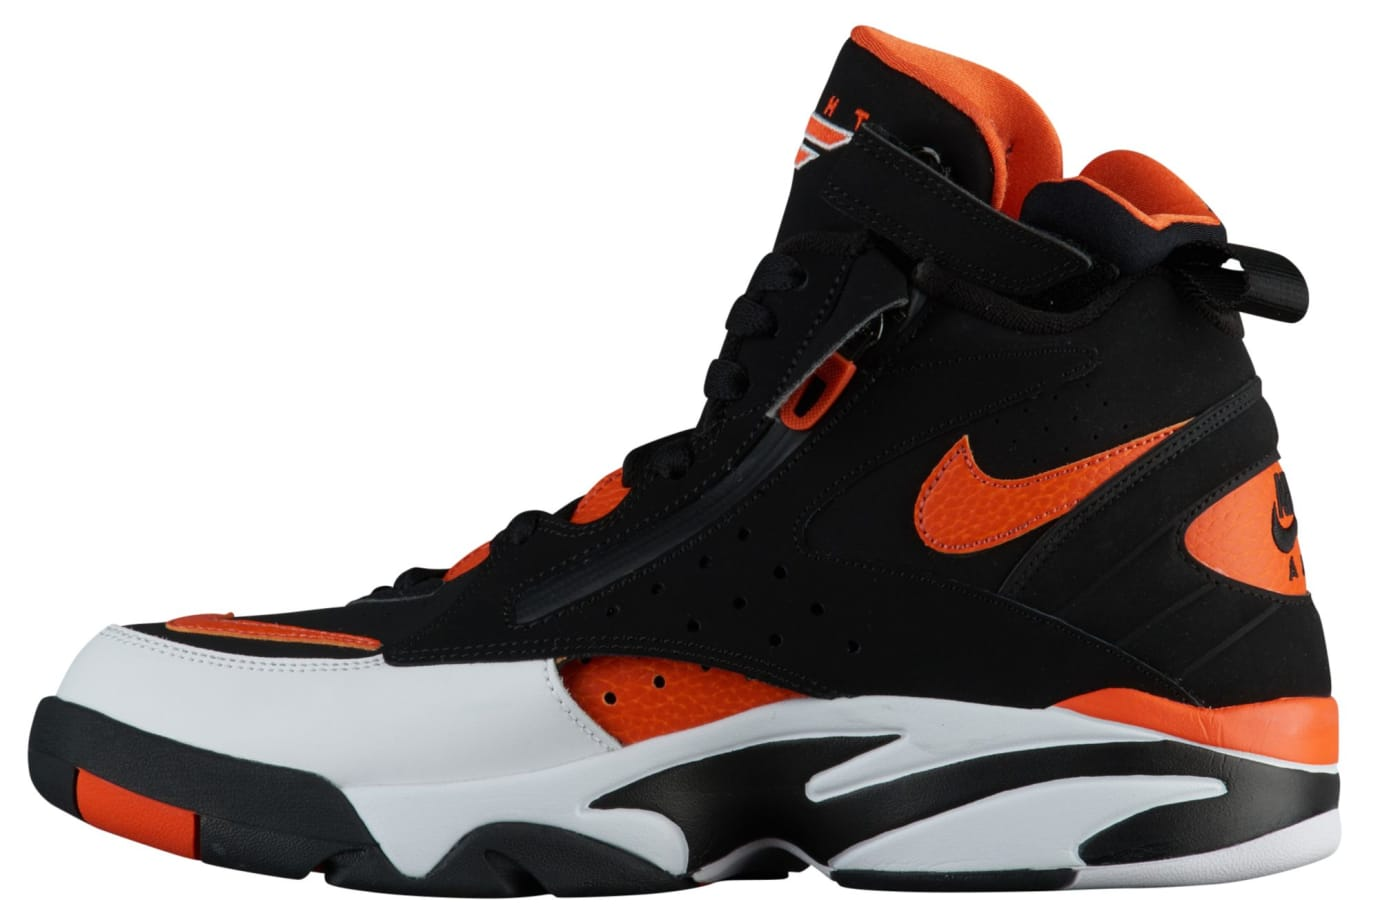 Nike Air Maestro 2 LTD Rush Orange Release Date AH8511-101 Medial